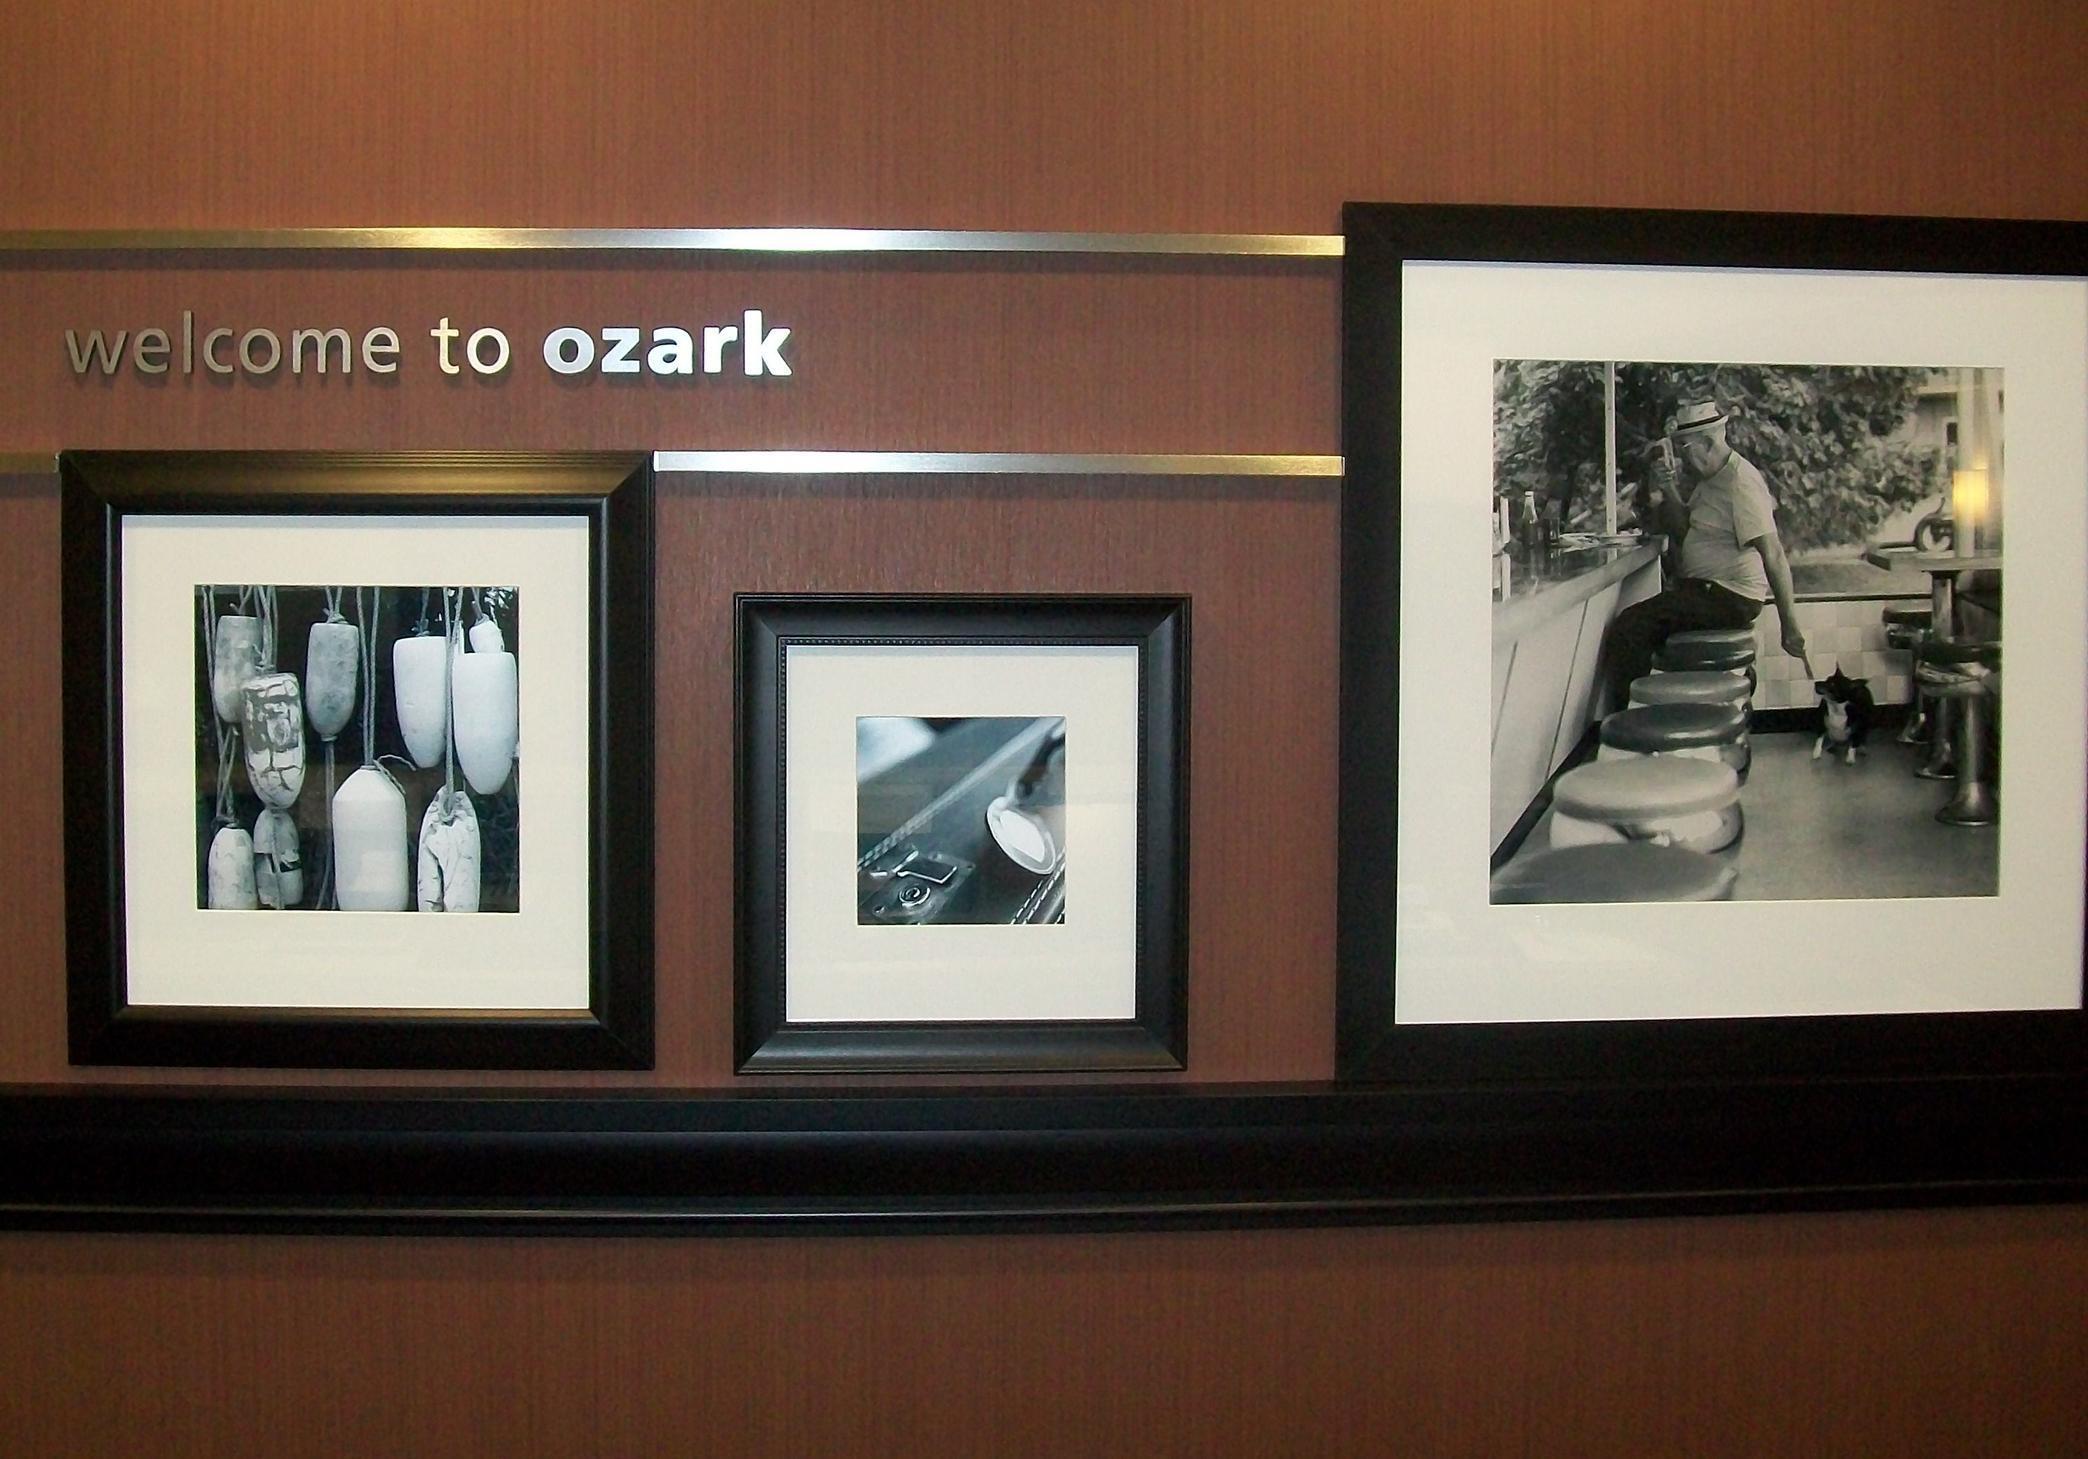 Hampton Inn Ozark image 1